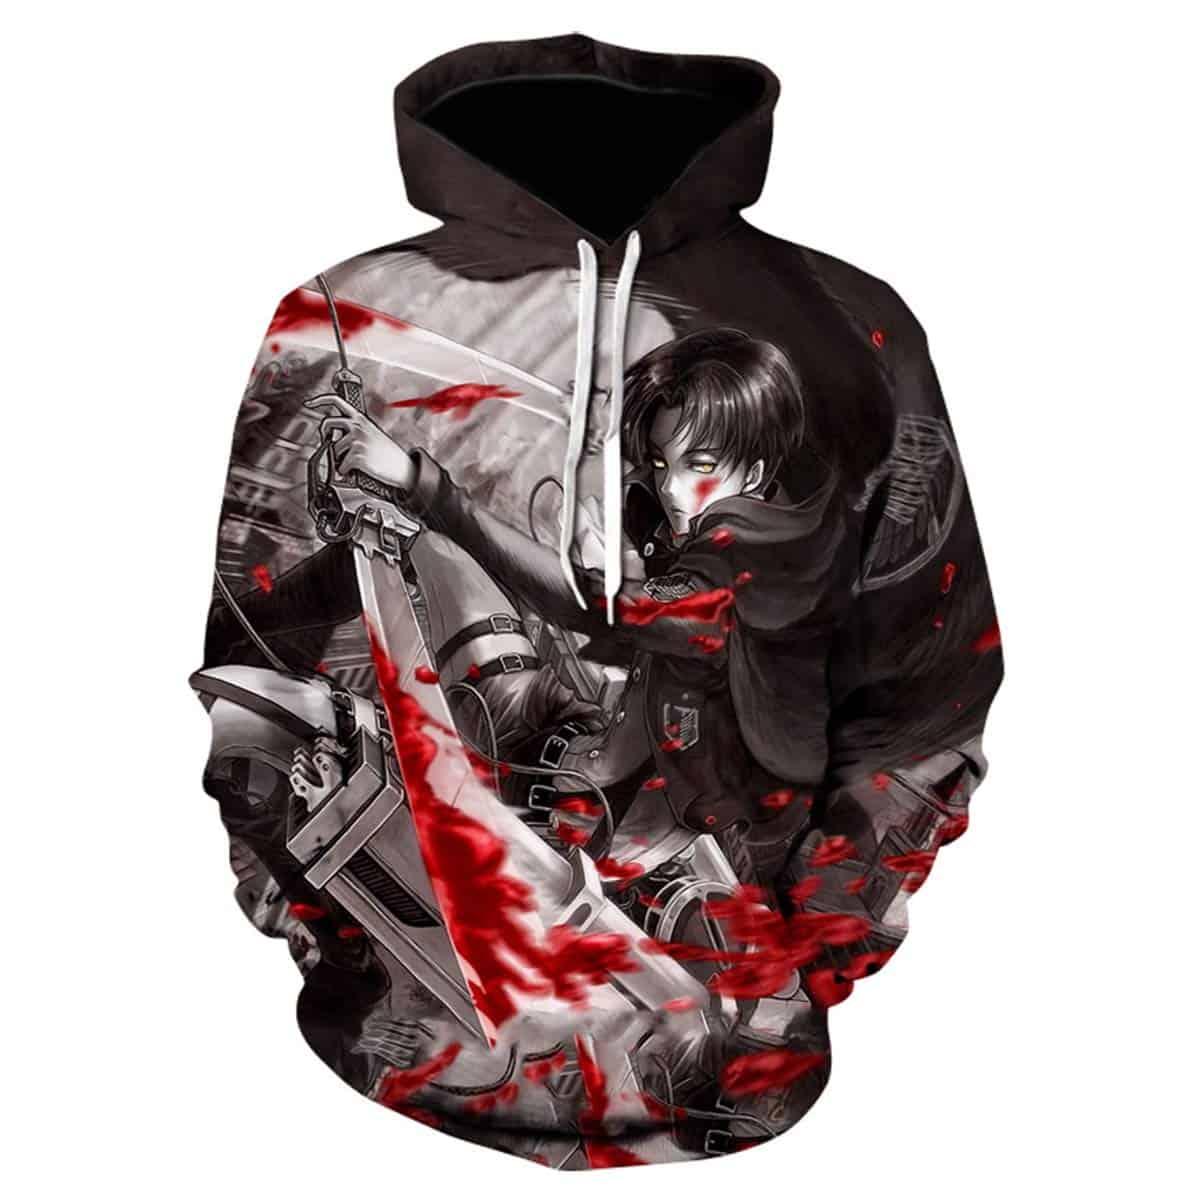 Men Hoodies & Sweatshirt Attack on Titan 3D Print Pullover with Front Pocket